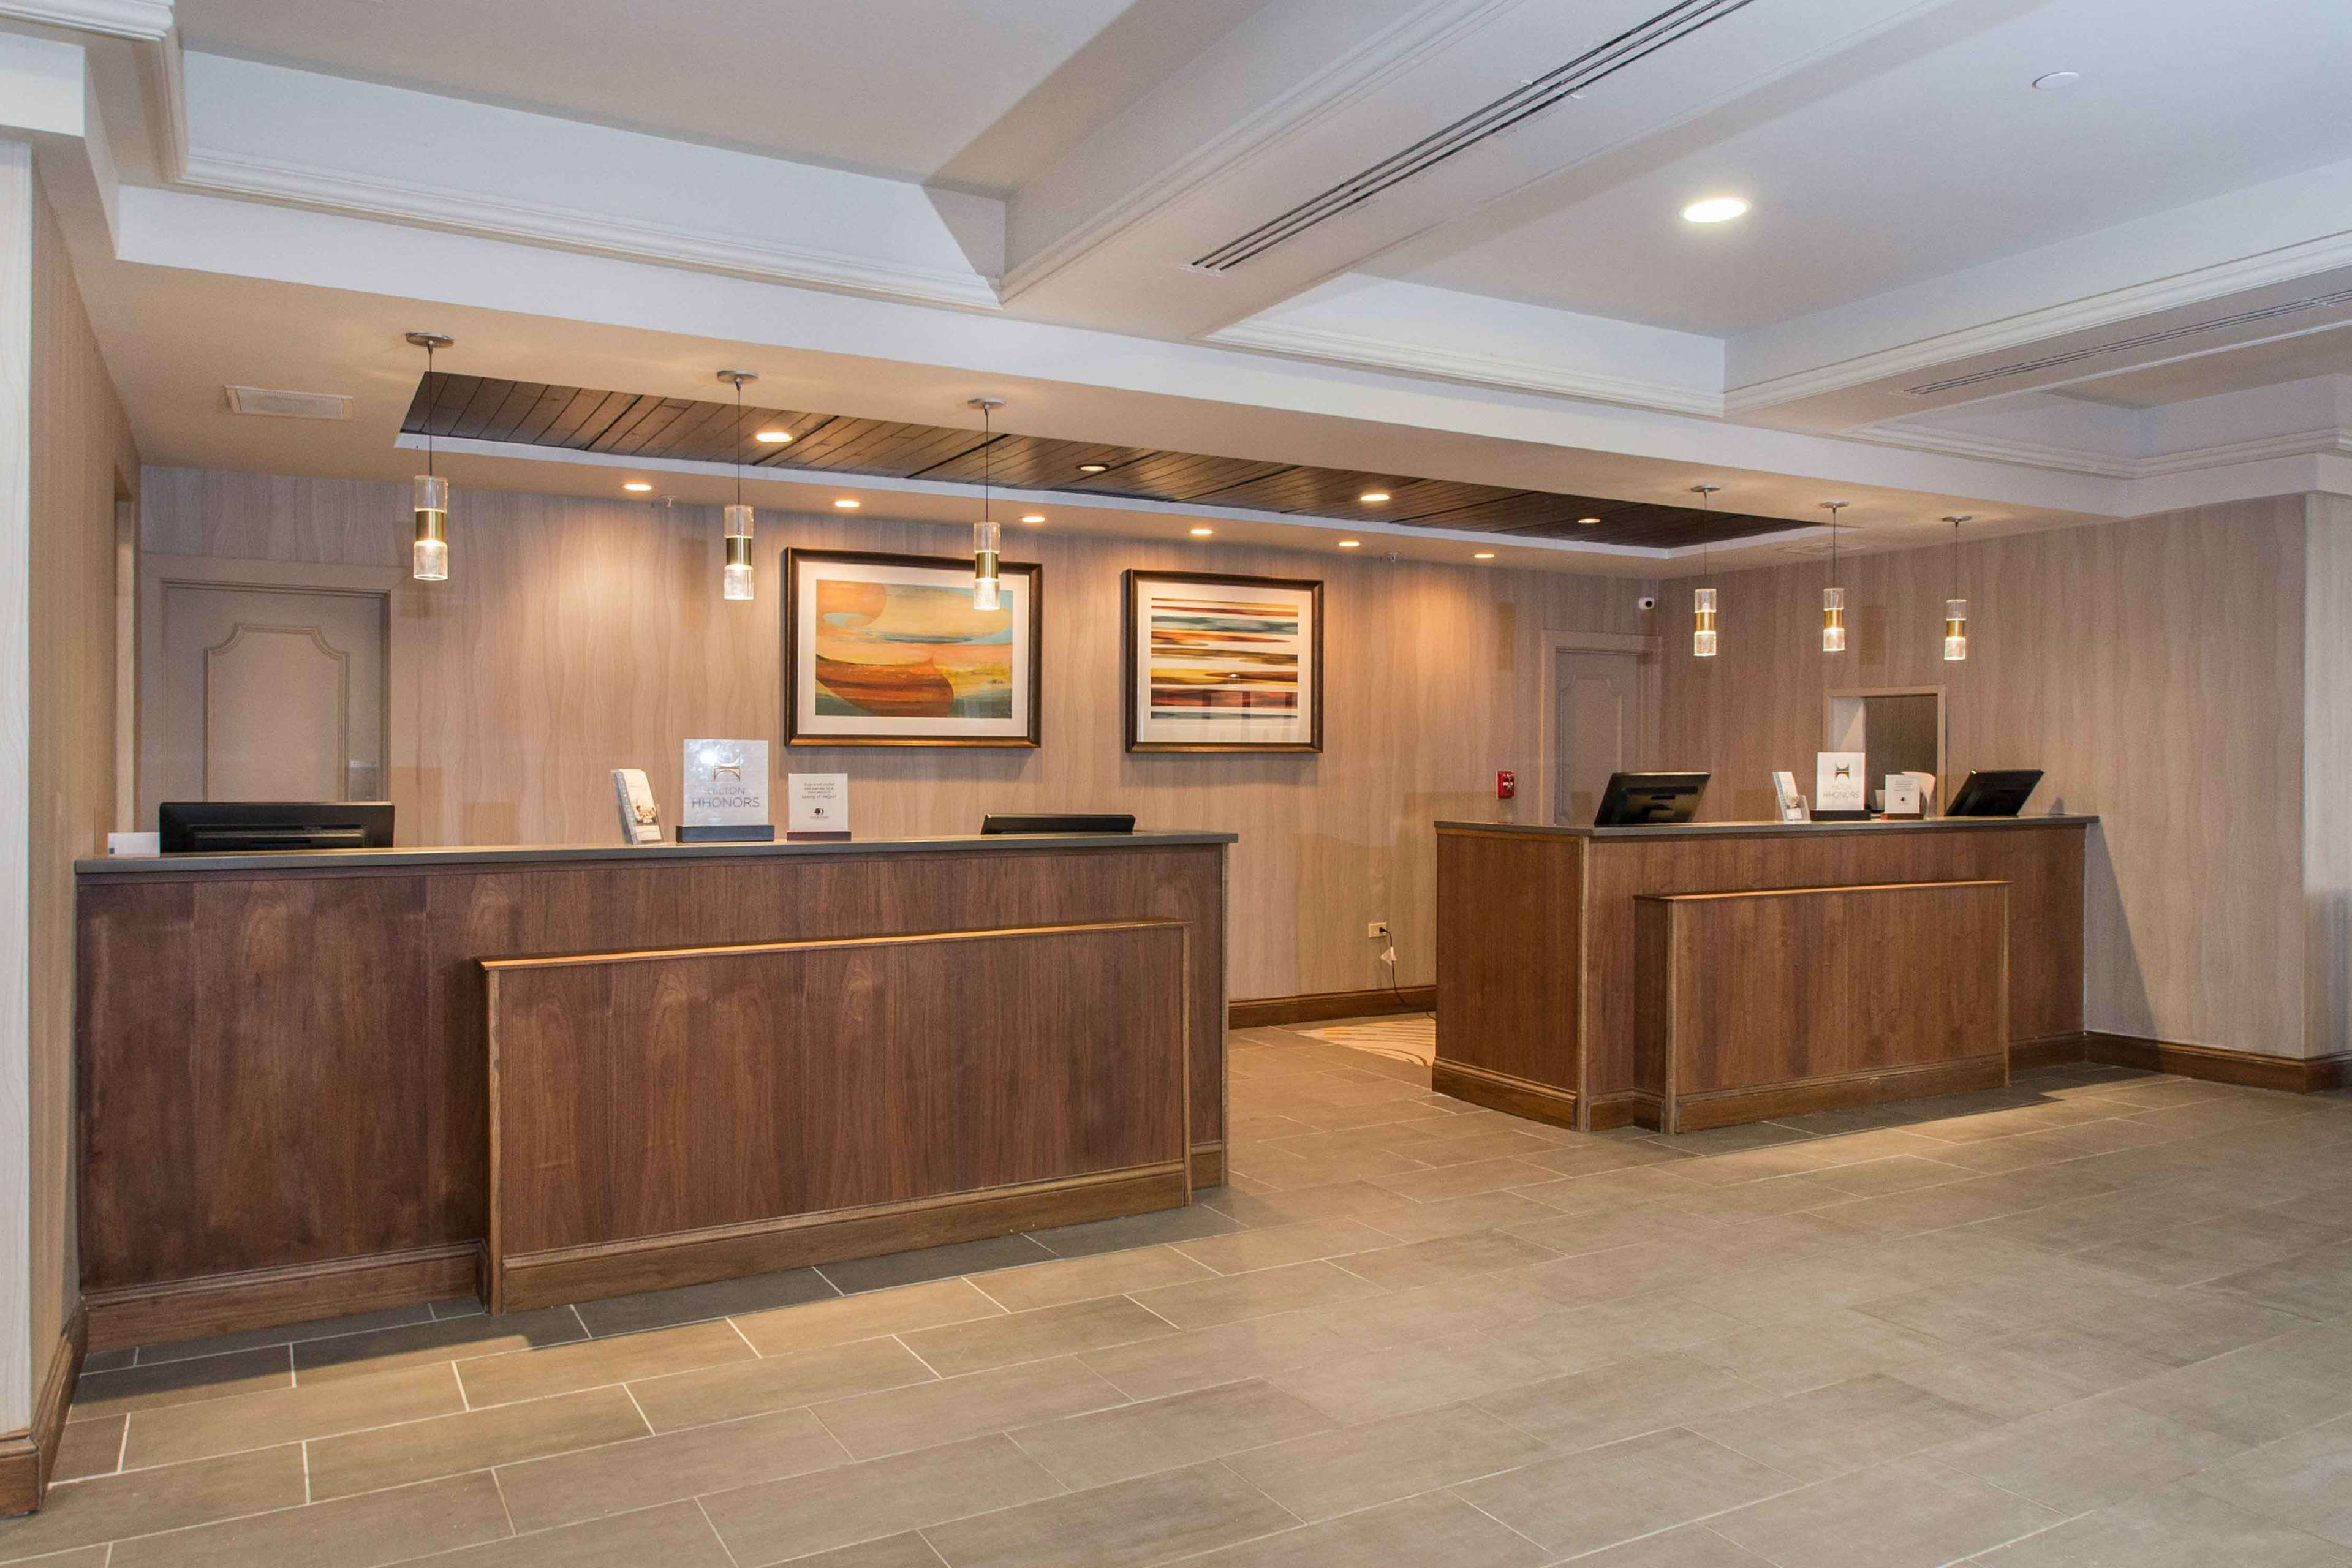 DoubleTree by Hilton Hotel Cleveland East Beachwood image 21